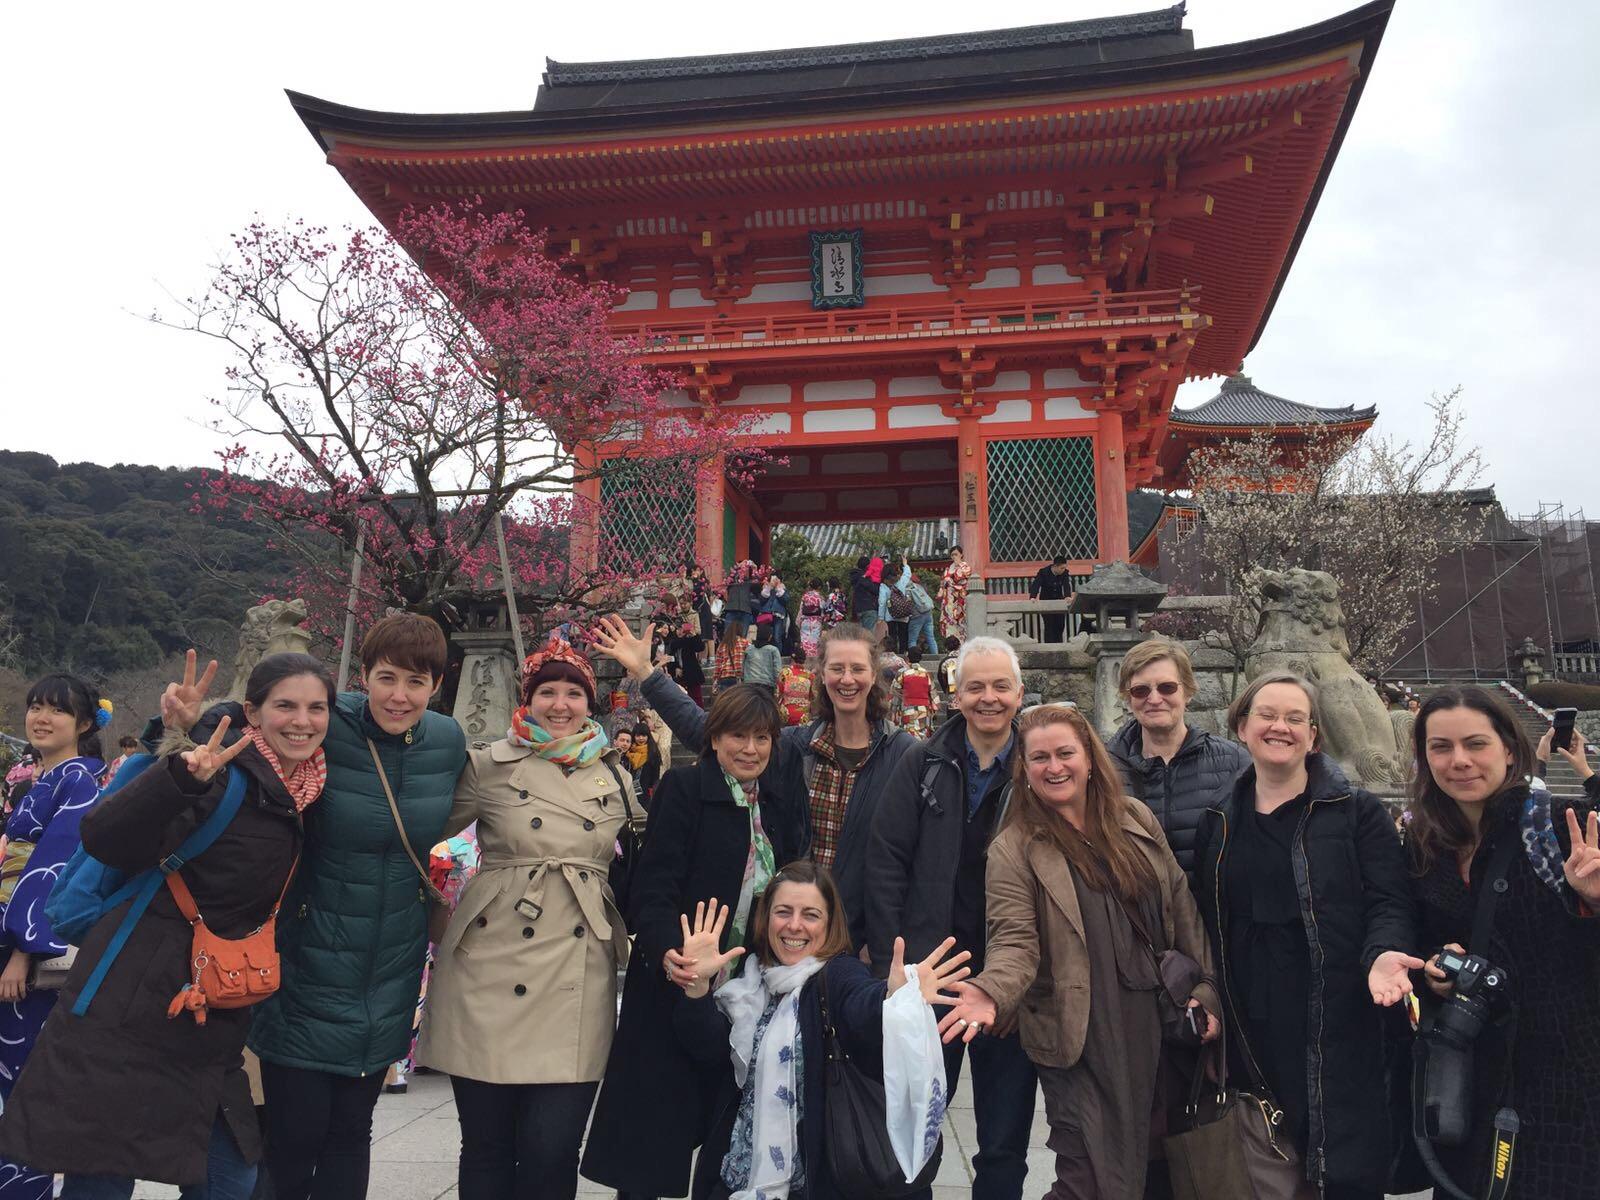 Japan Tour Day City Of London Sinfonia - Japan tour